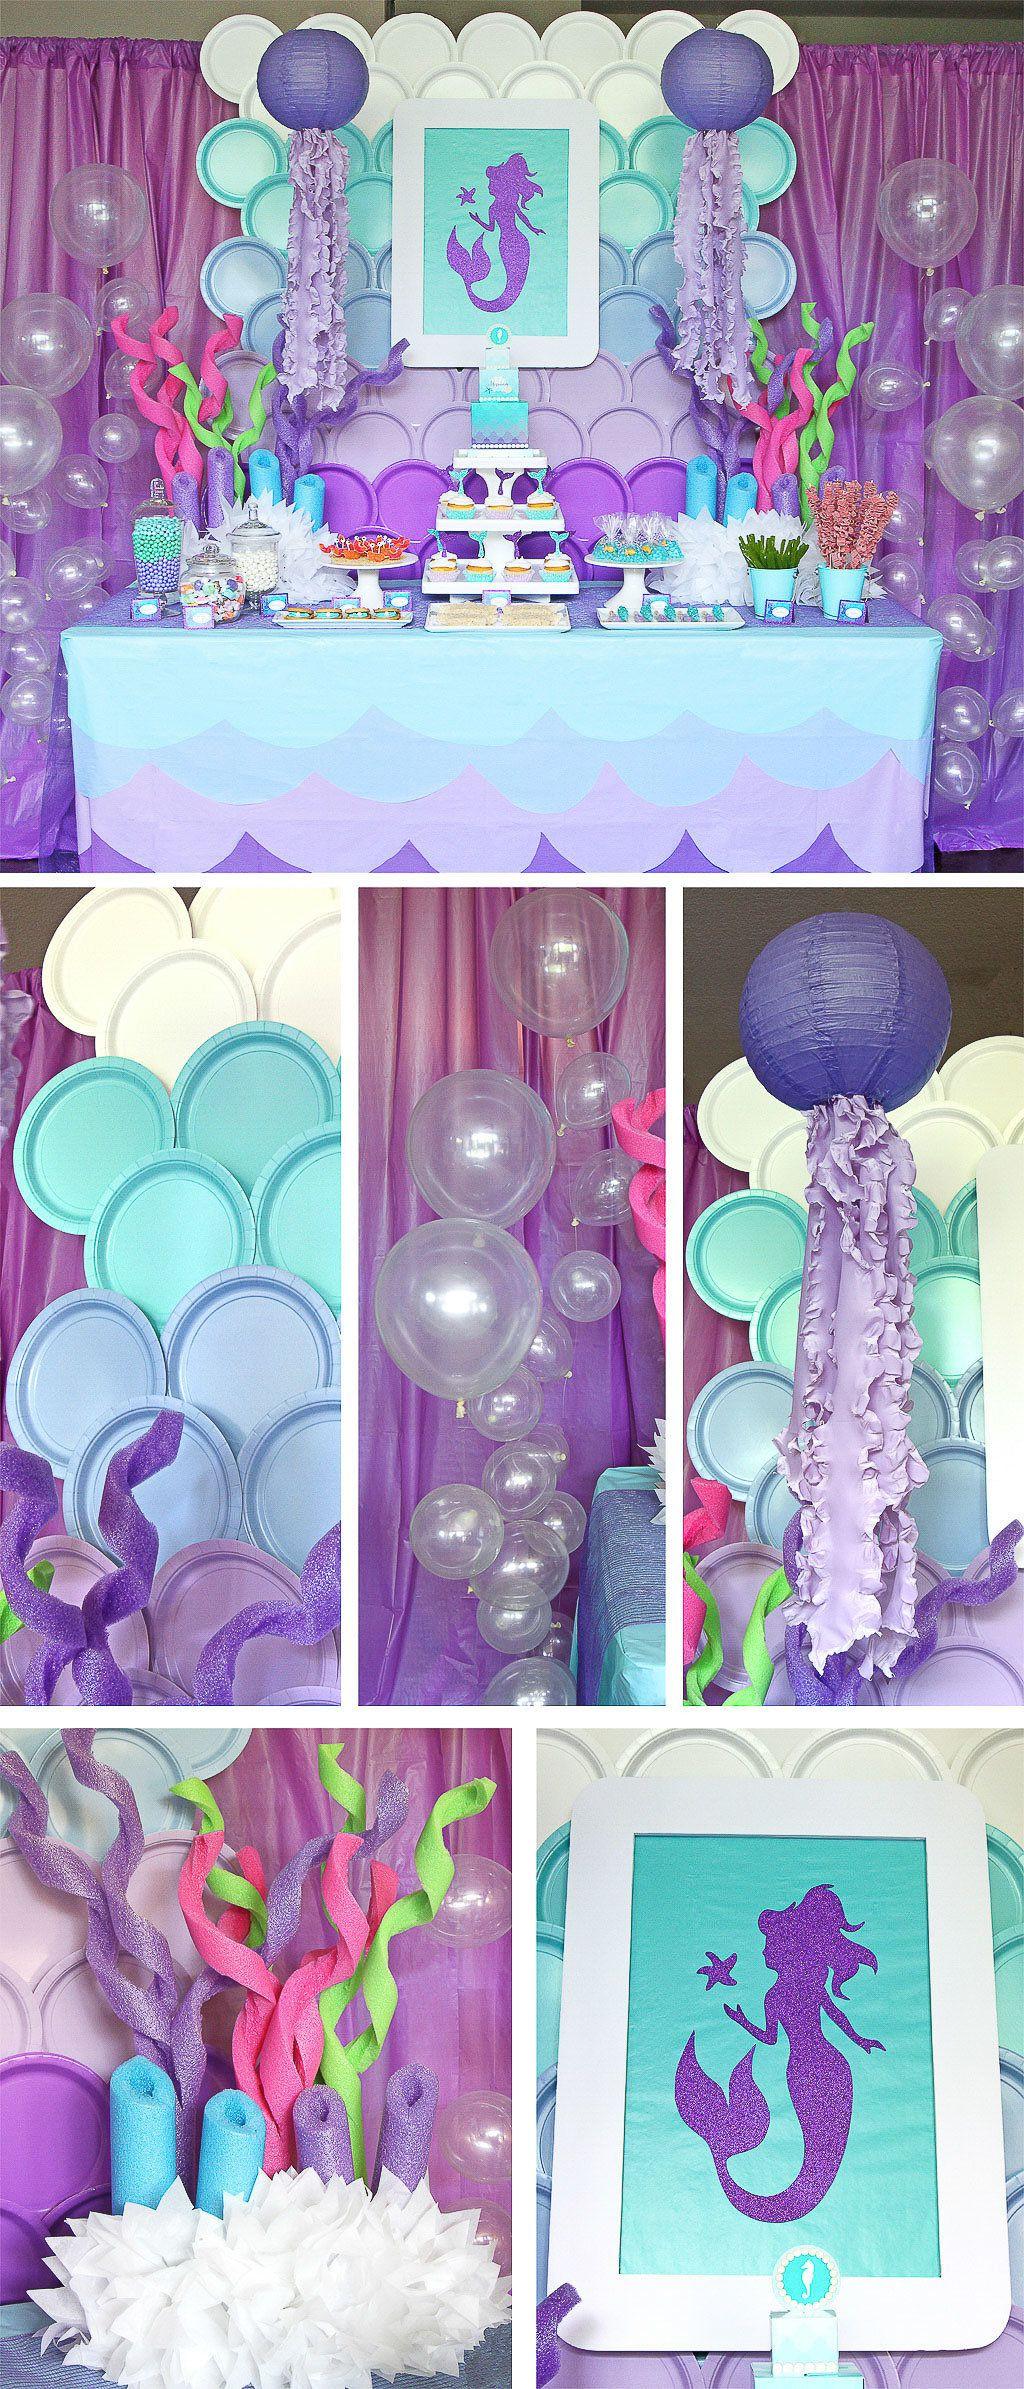 Mermaid Party Decor Ideas  Mermaid Party Ideas